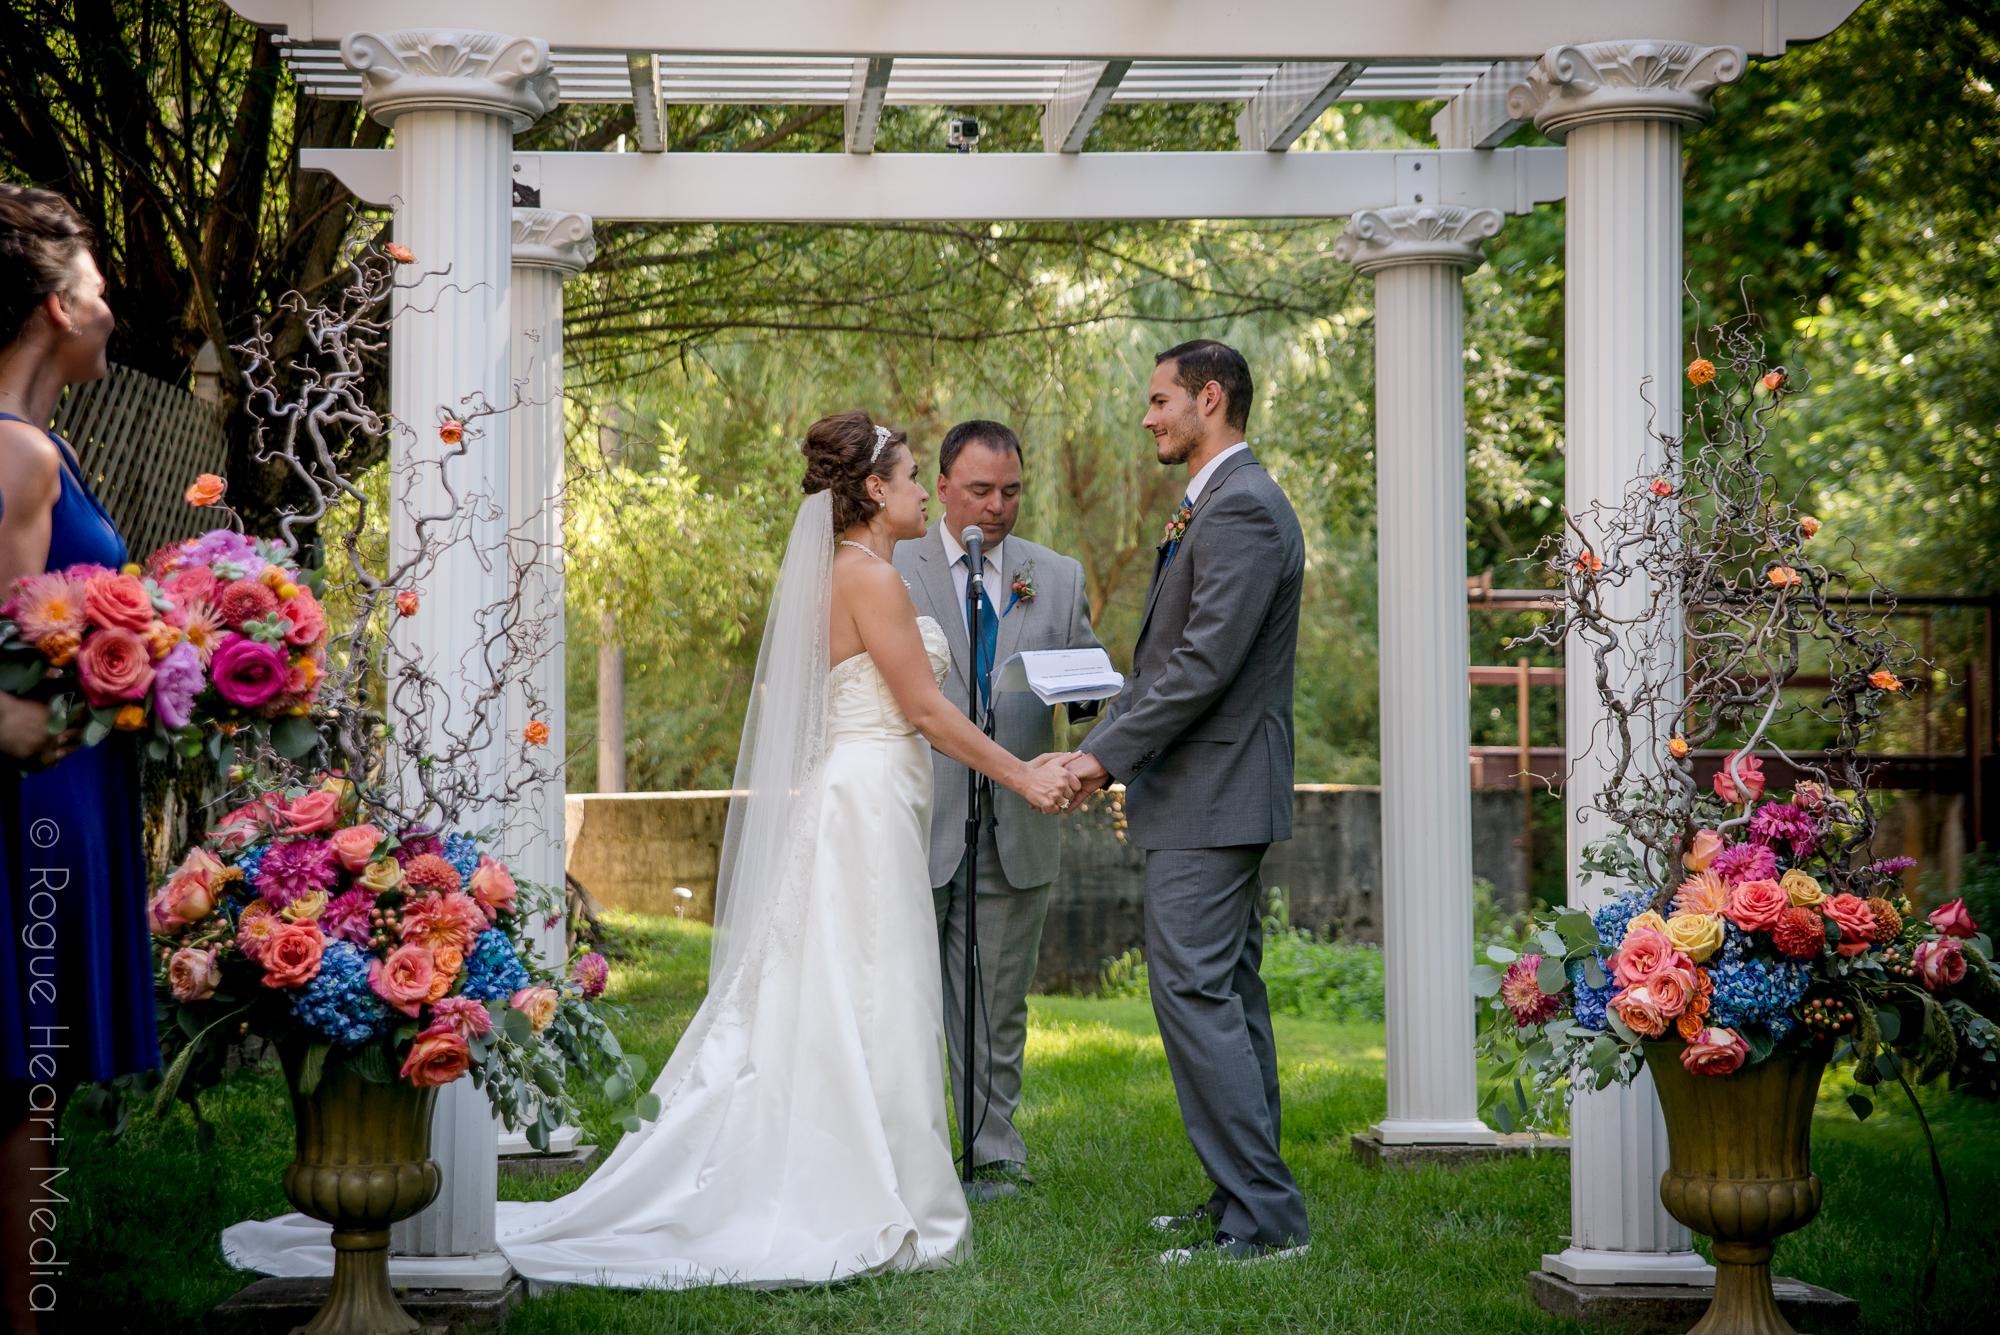 Commellini Estate, Event planning, Spokane Wedding Planner, Desiree, Summer Wedding, Outdoor Summer Wedding